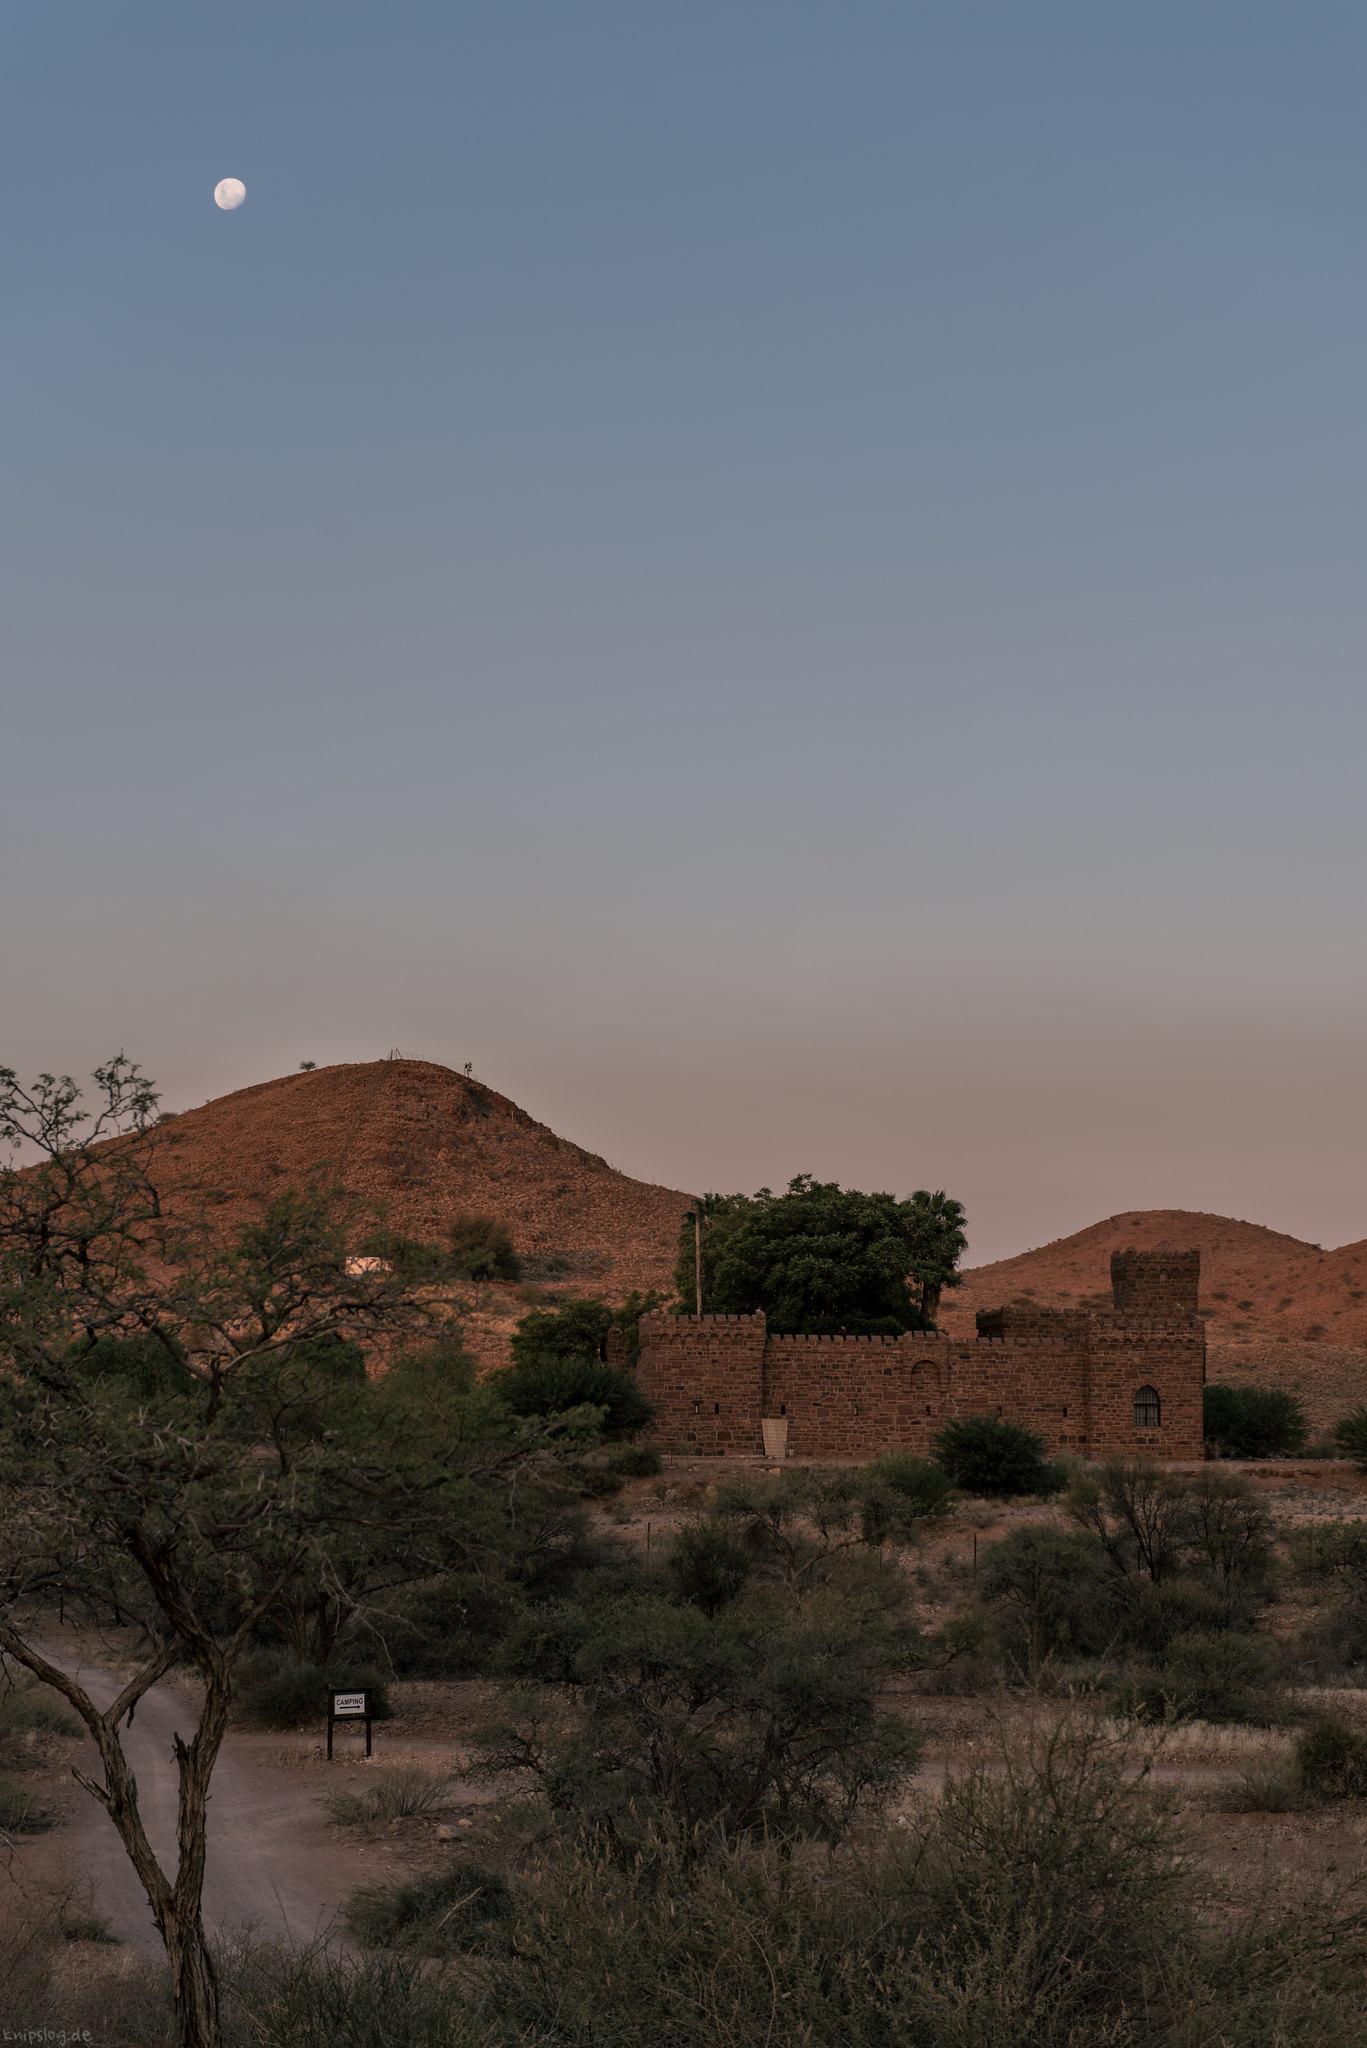 Moon shine at Dwusib castle